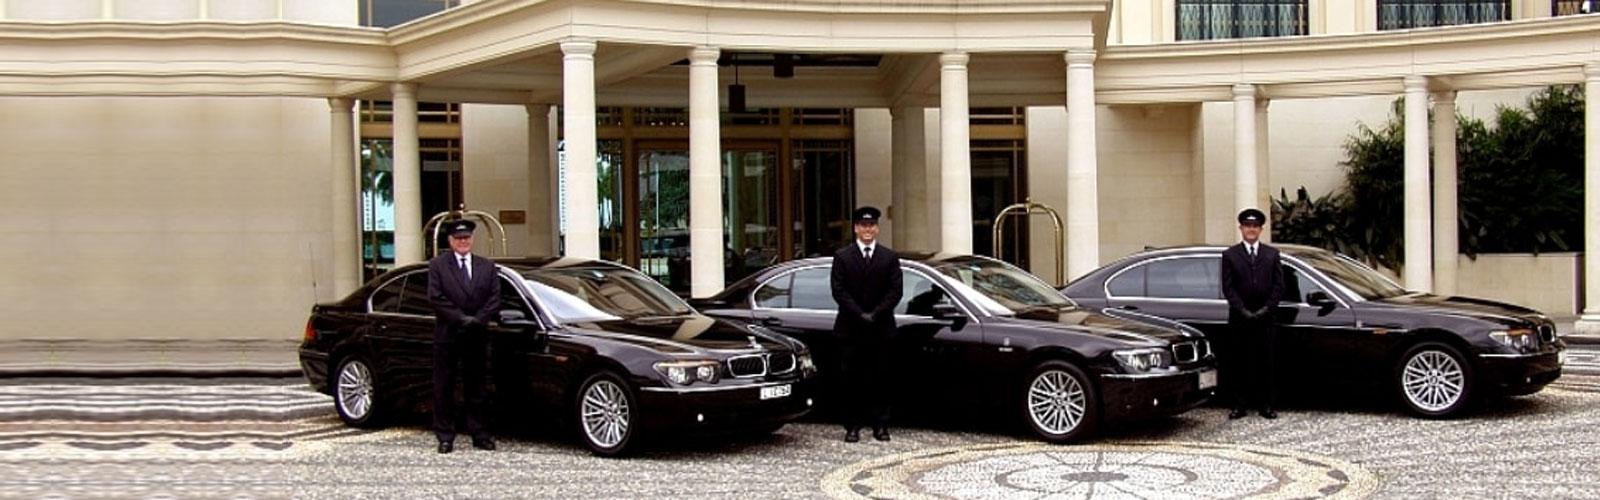 VIP Transfer Services Melbourne